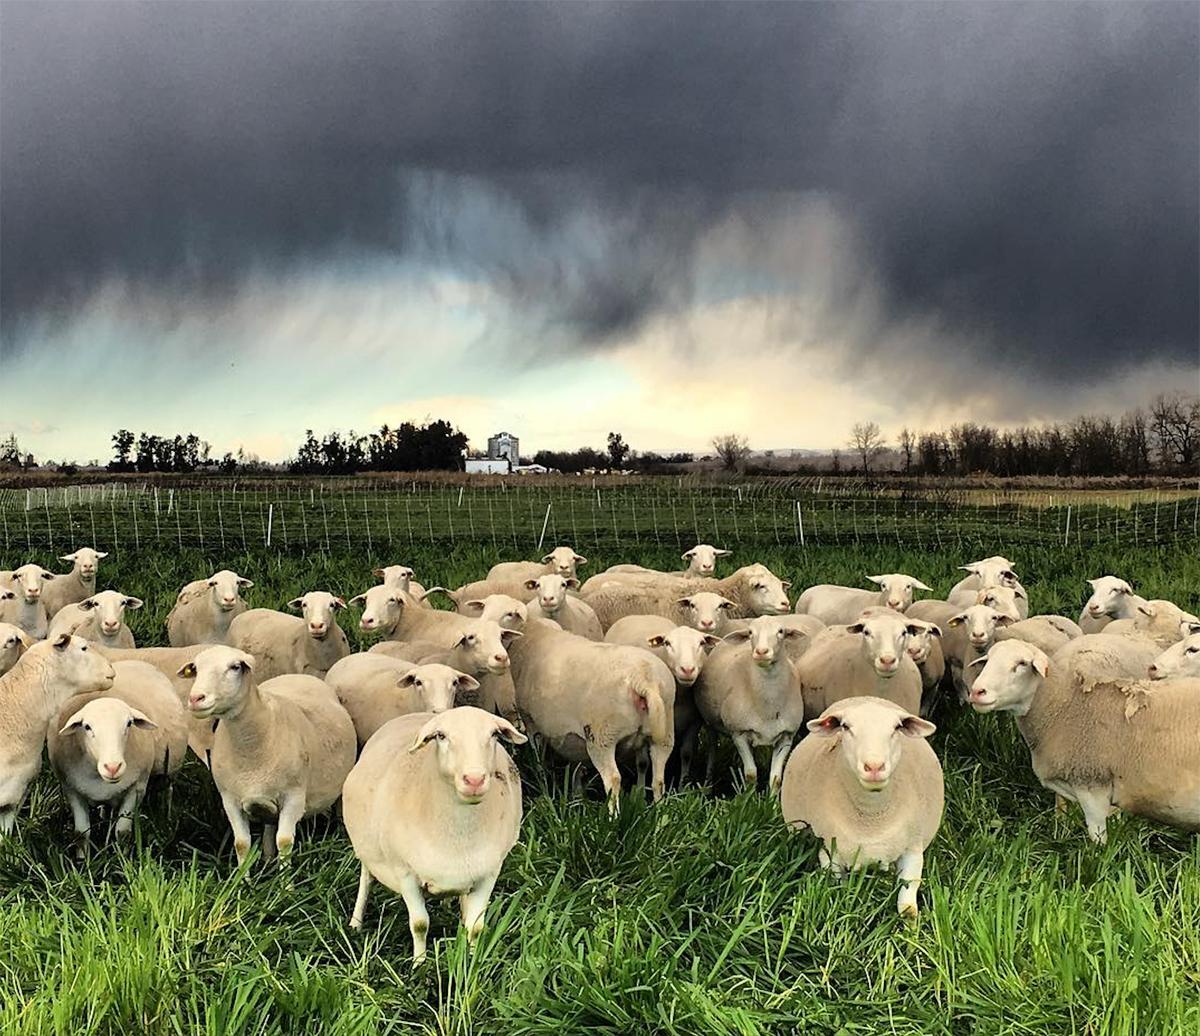 Sheep before an approaching storm.